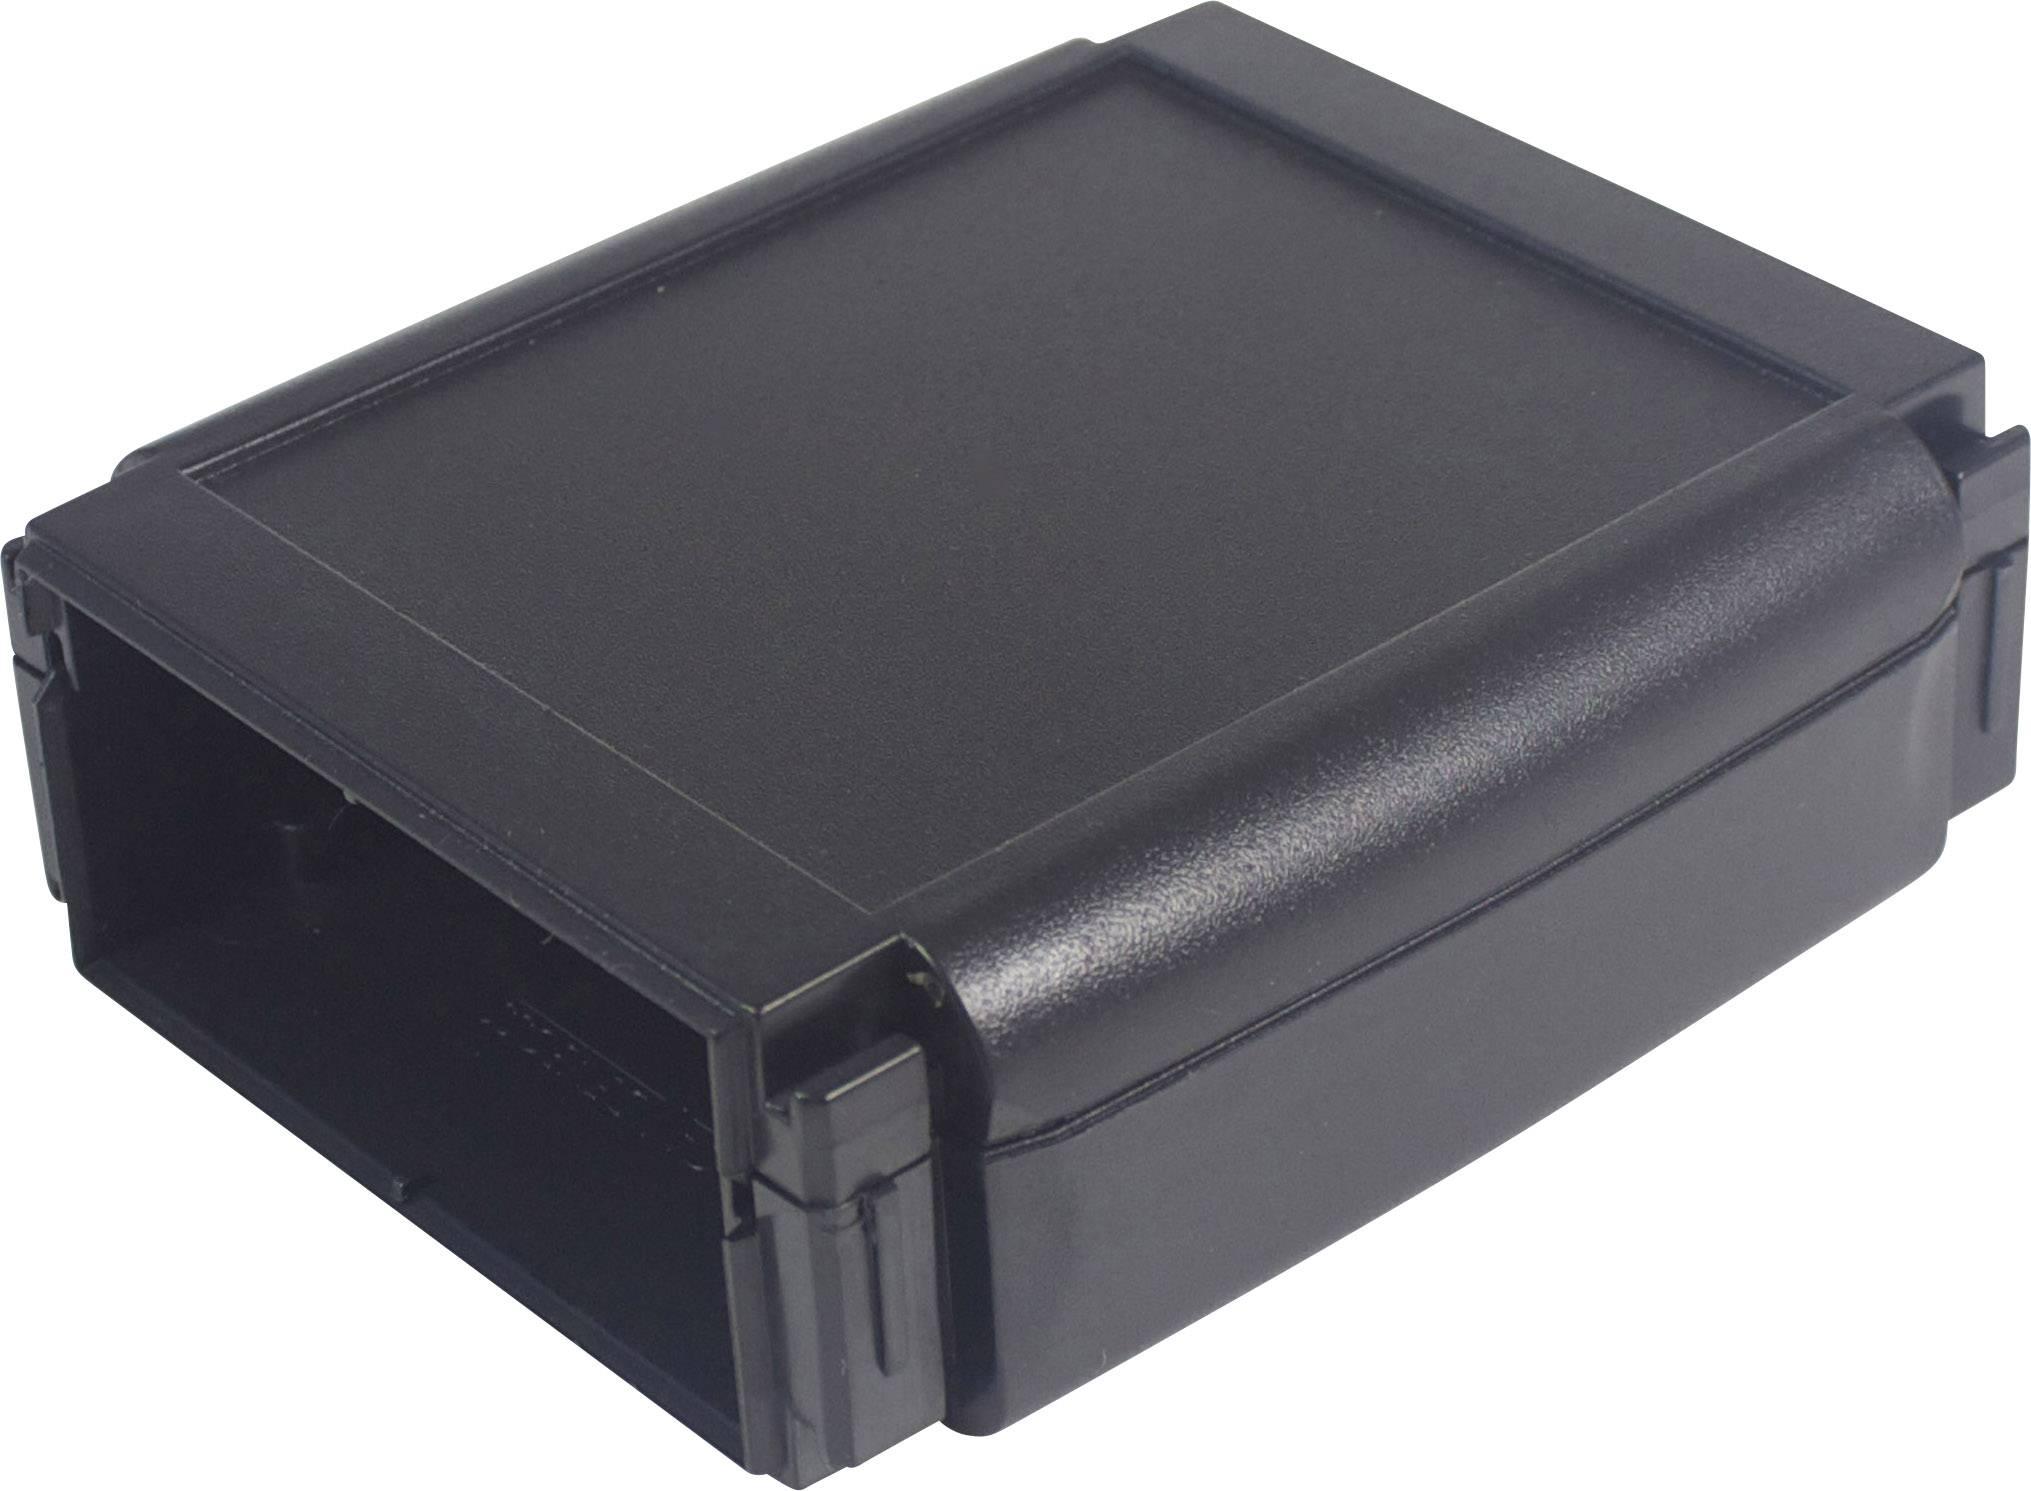 Plastová krabička Axxatronic CHH642BBK, 100 x 80 x 30 mm, ABS, černá, 1 ks